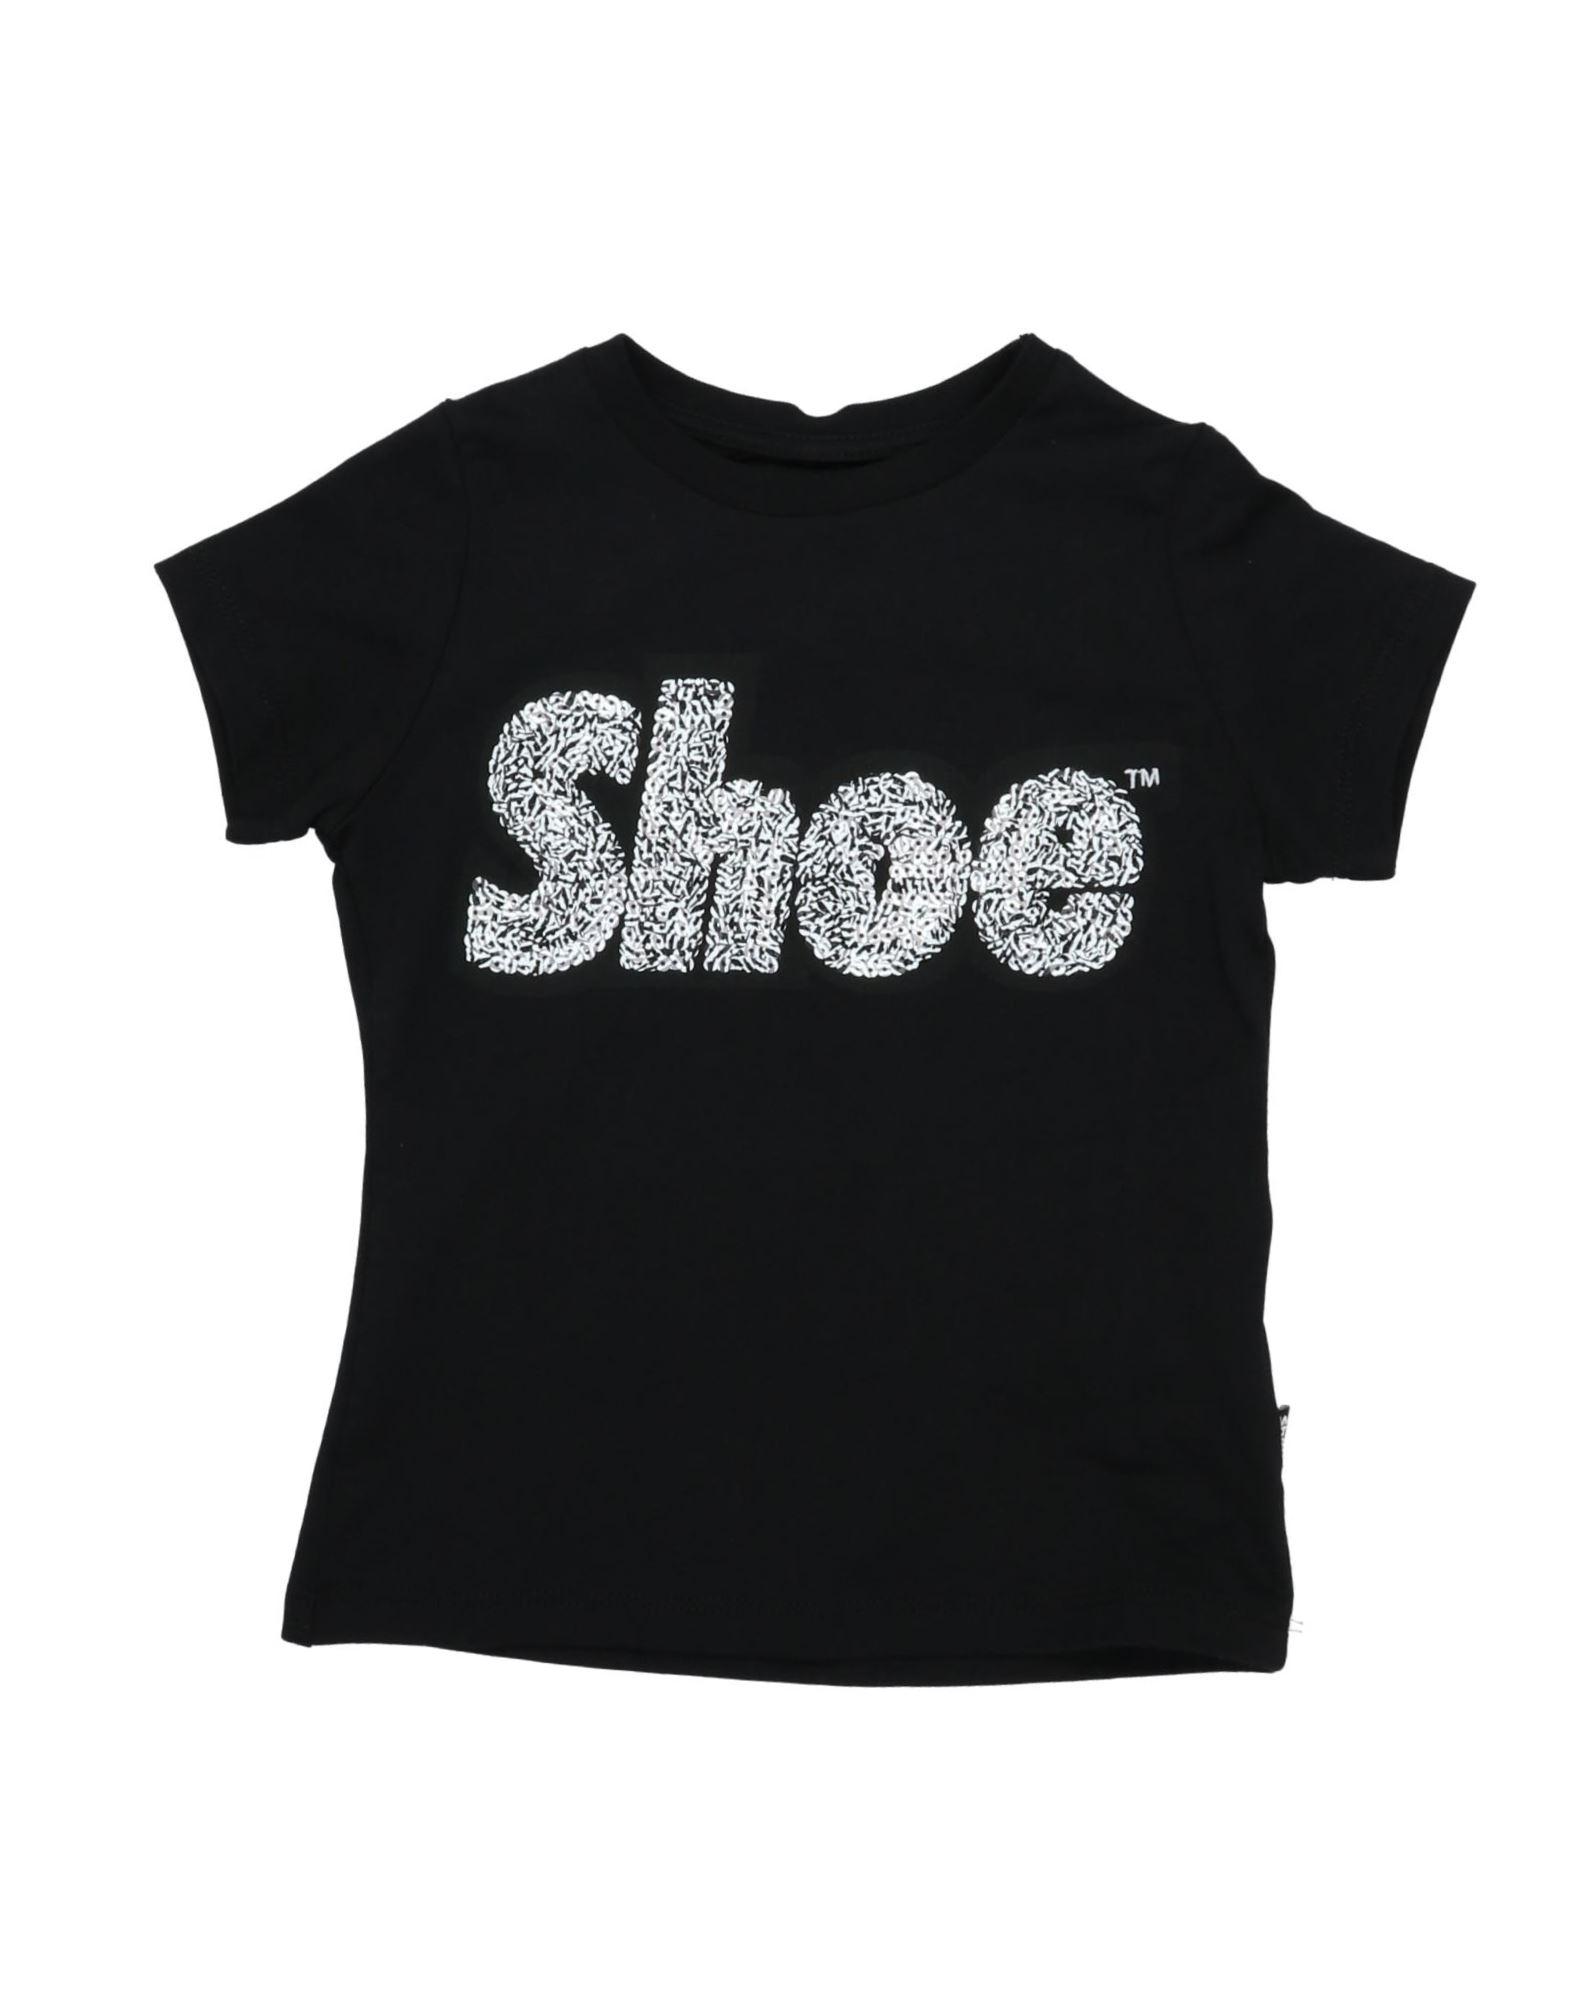 Shoeshine Kids' T-shirts In Black